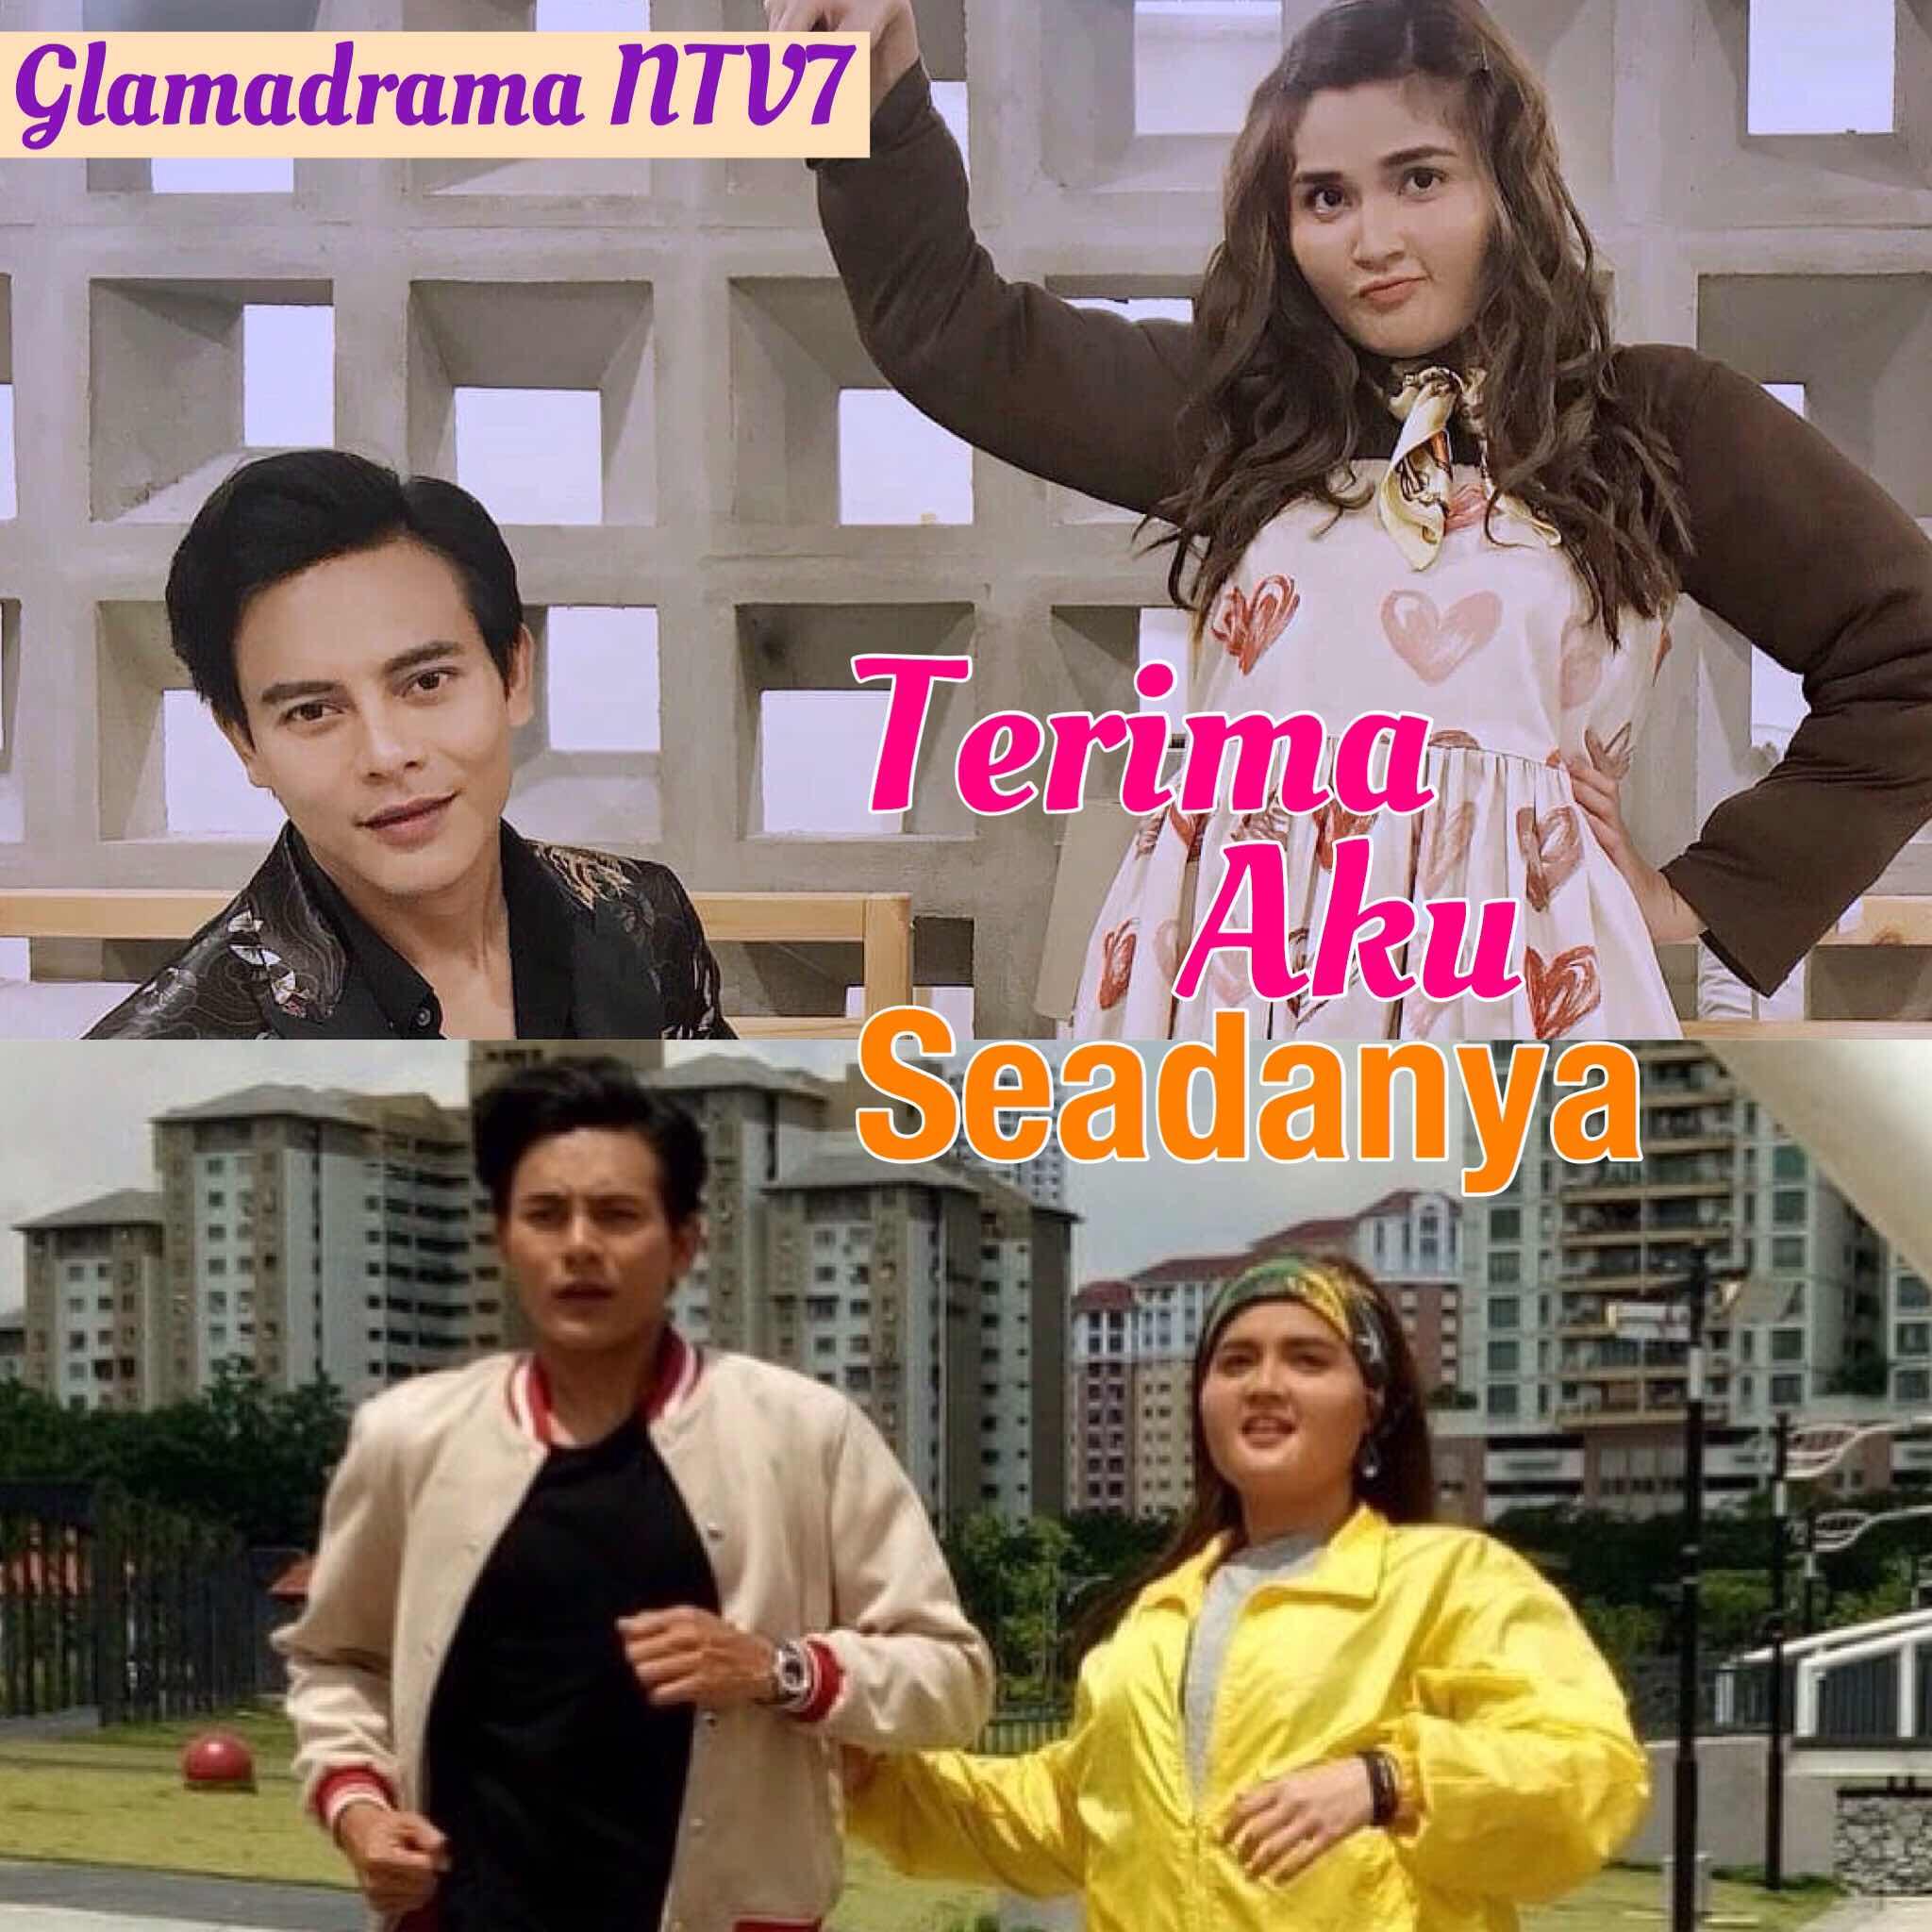 Permalink to Drama Terima Aku Seadanya, akan datang di slot Glamadrama NTV7